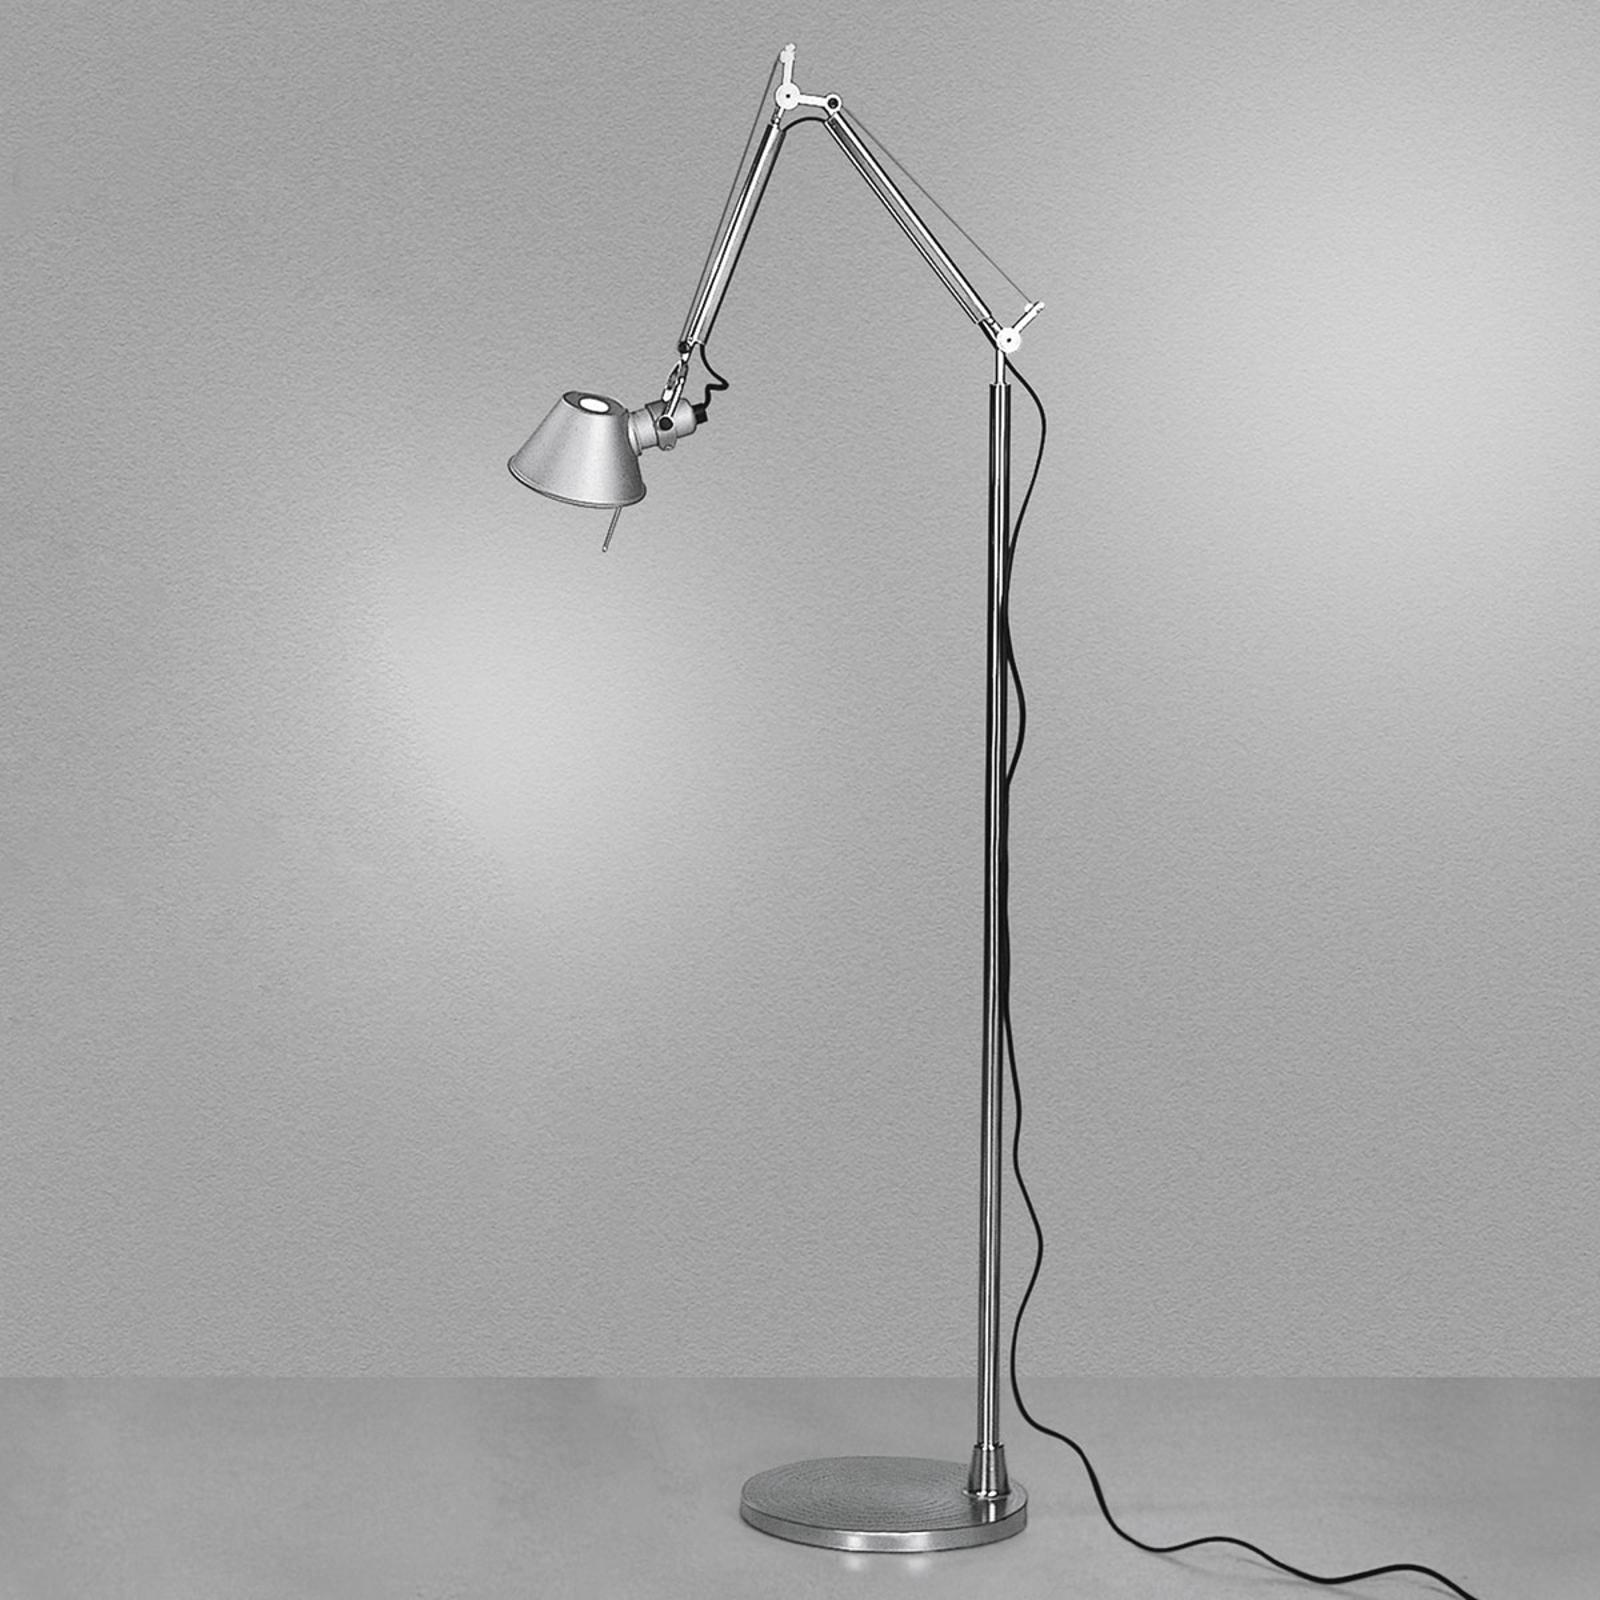 Artemide Tolomeo Micro lampa podłogowa LED 3000K